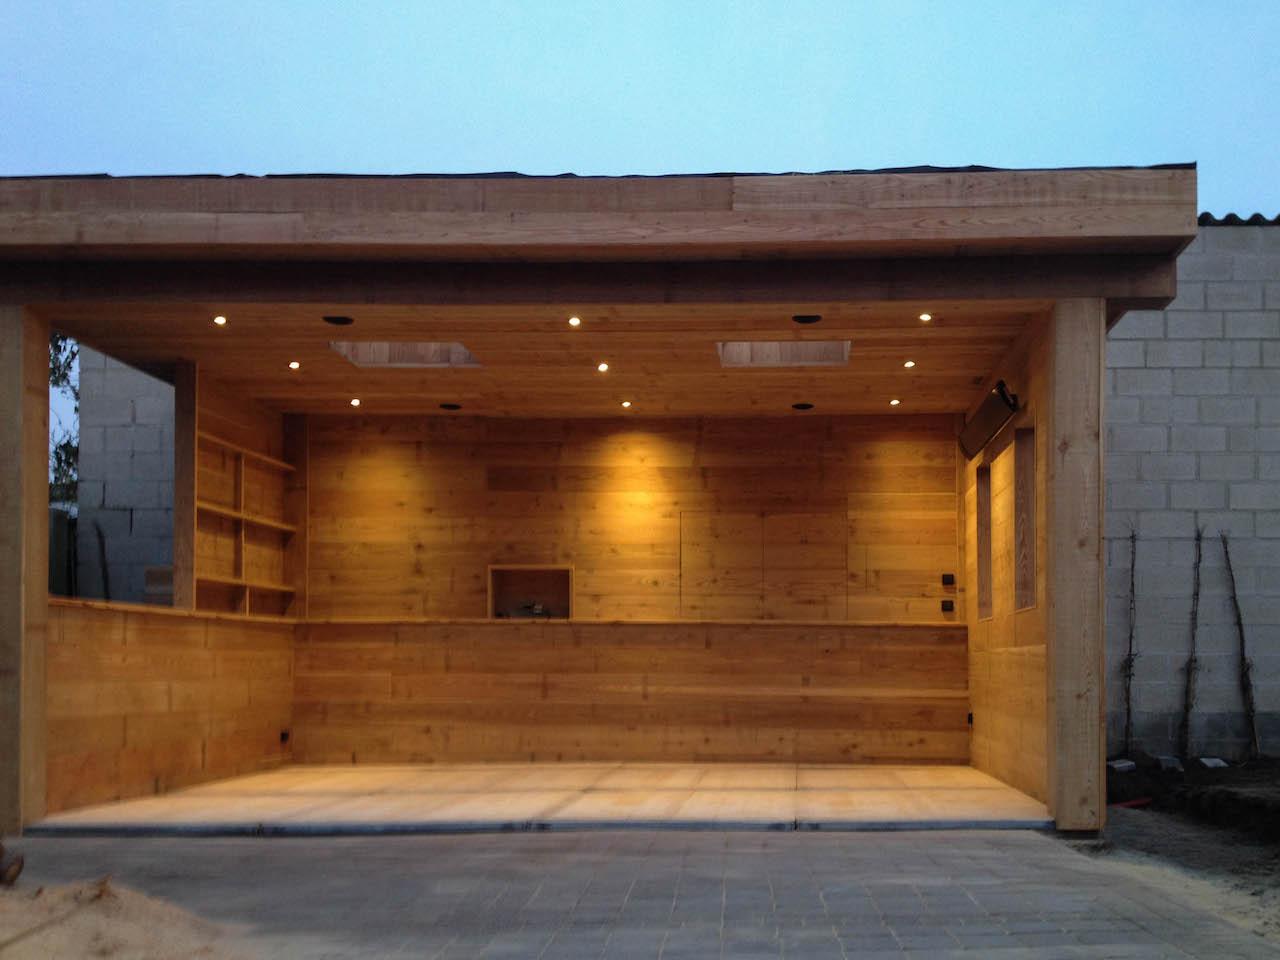 Infrarood Verwarming Garage : Franks tuinkamer treelife boomhutten tuinkamers buitenkeukens